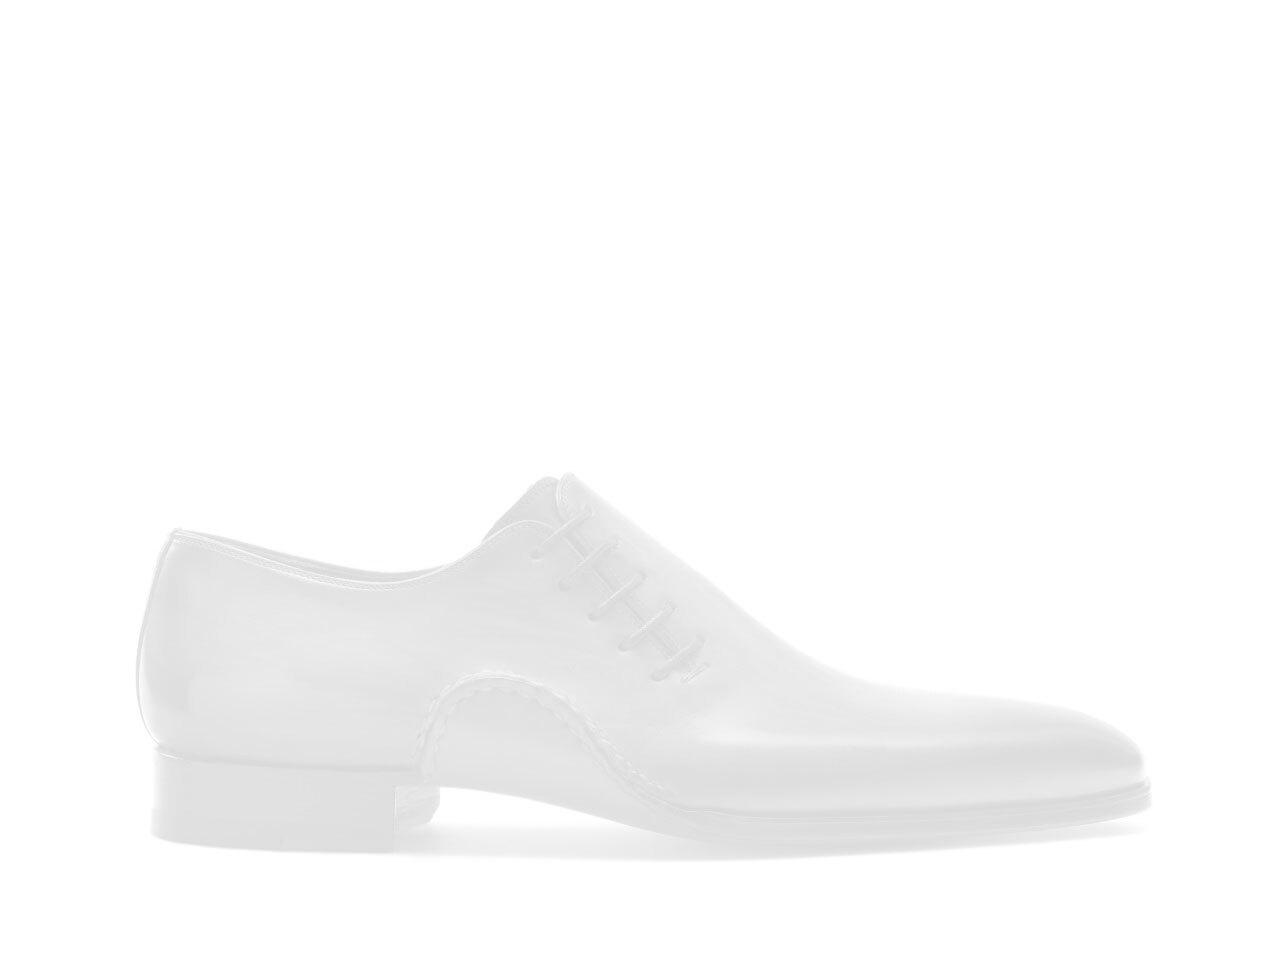 Side view of the Magnanni Cruz Grafito Men's Oxford Shoes